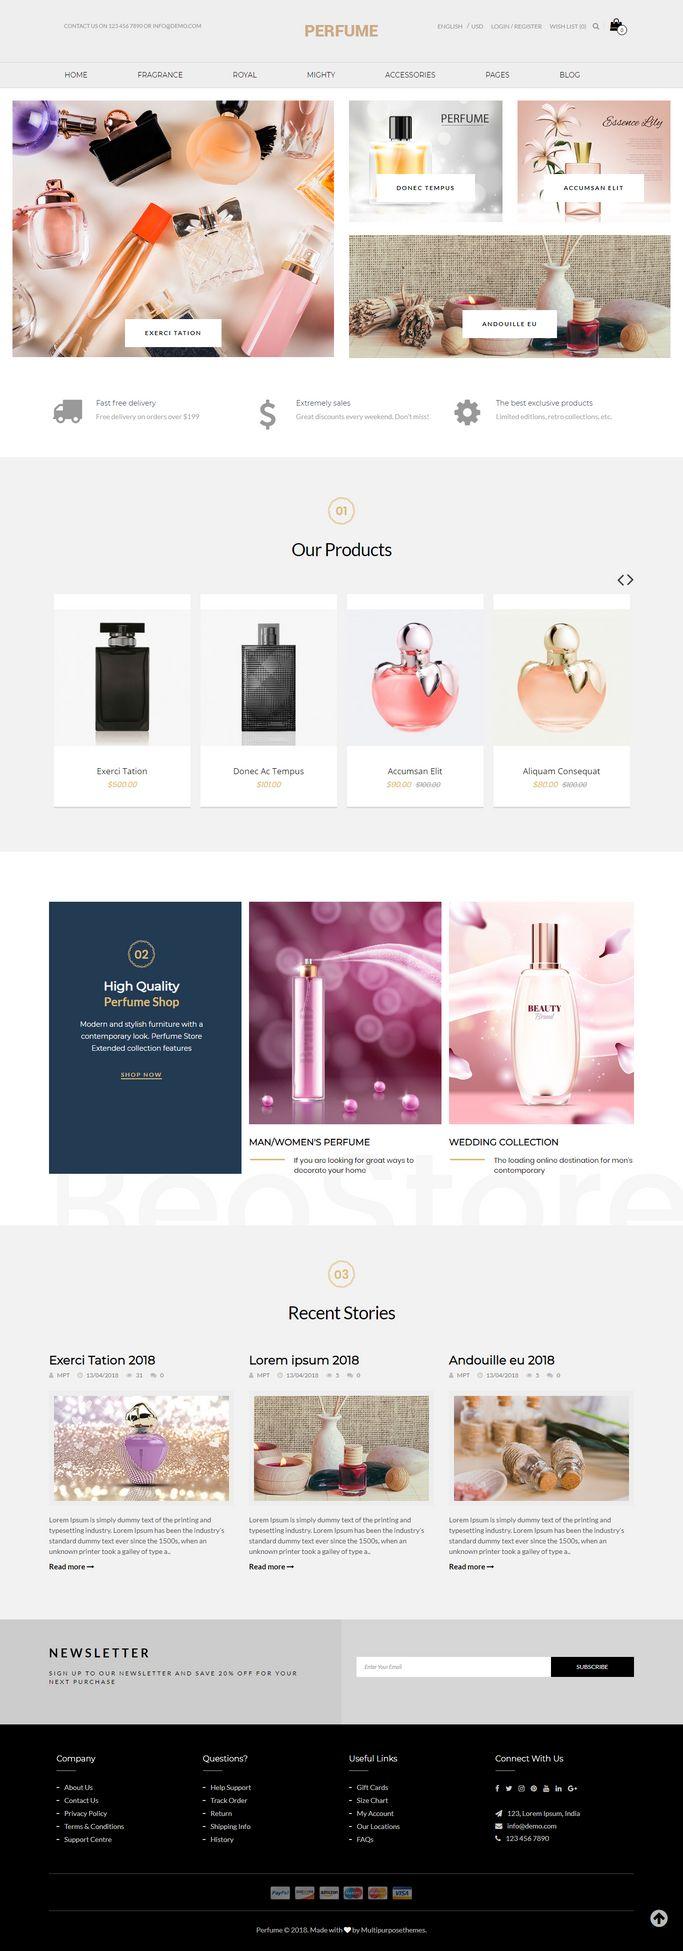 screencapture-opencart-multipurposethemes-perfume-oc02-2018-11-13-11_10_35